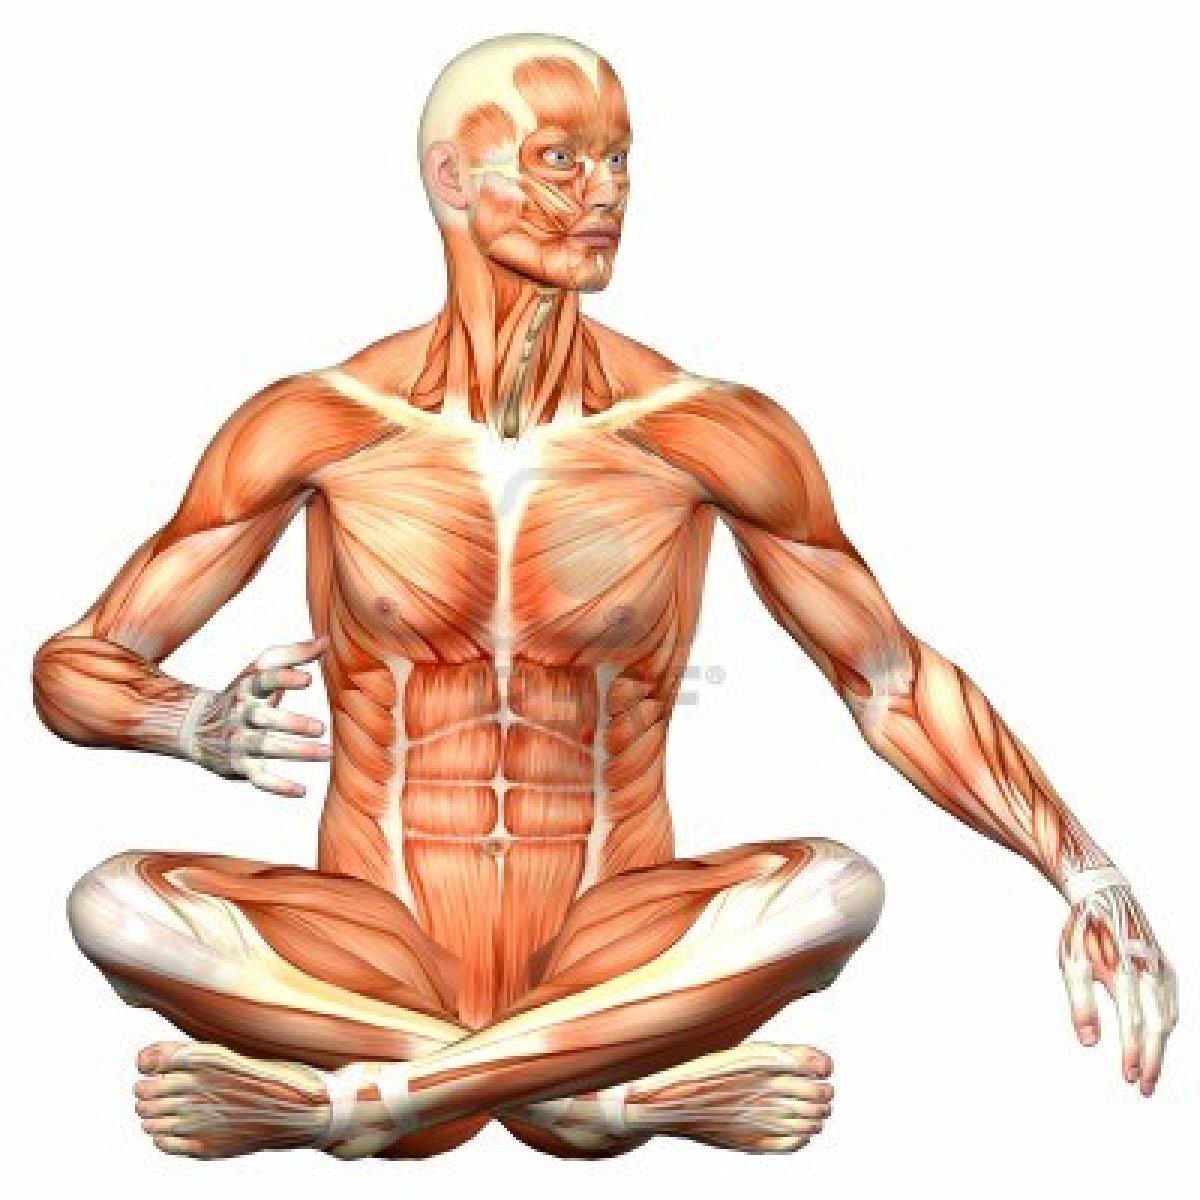 anatomía: ANATOMÍA HUMANA